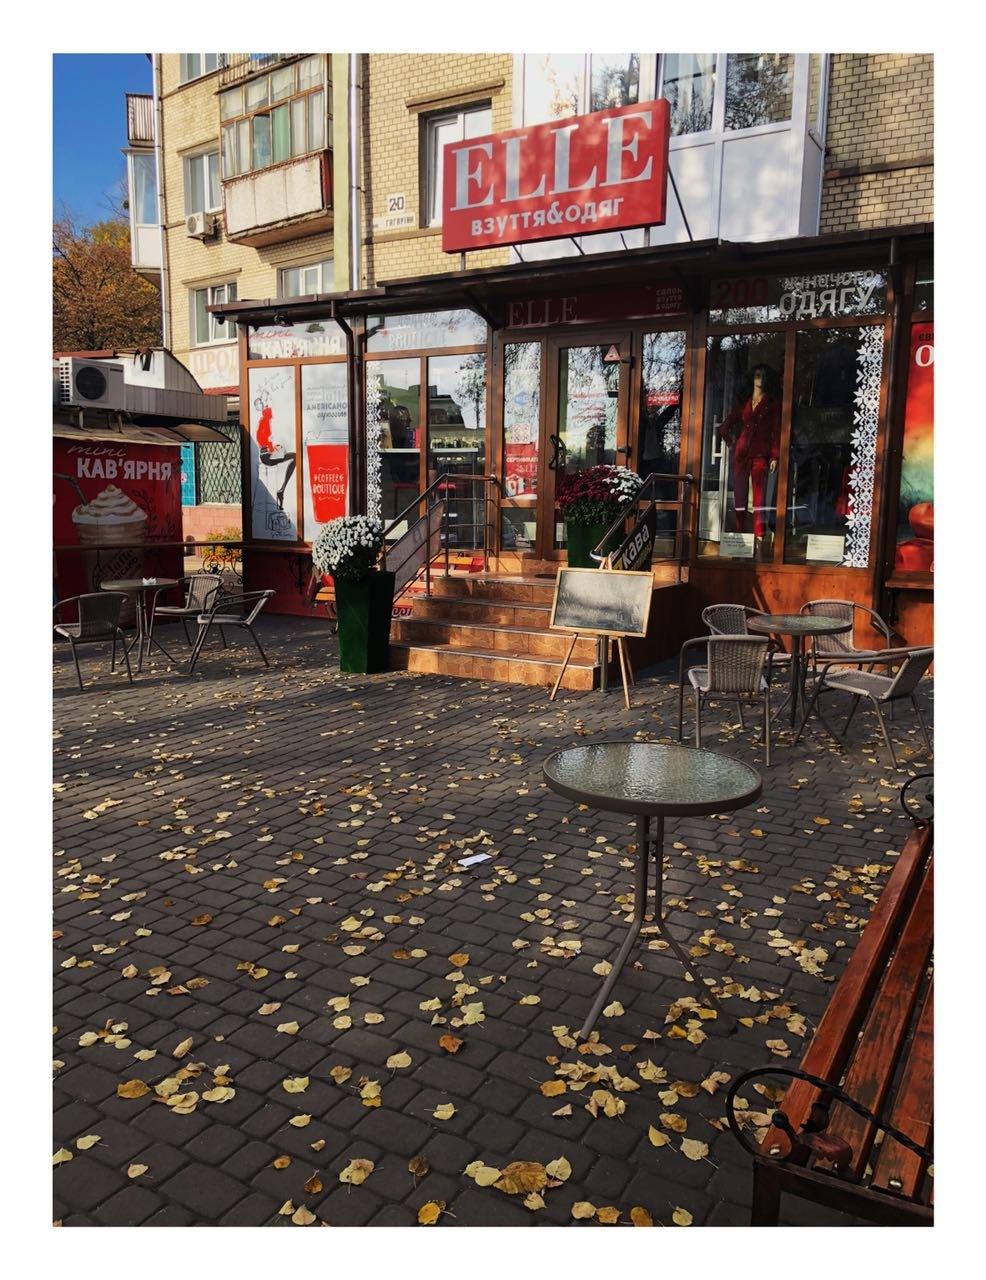 Кохання з присмаком кави: де у Хмельницькому провести День закоханих, фото-28